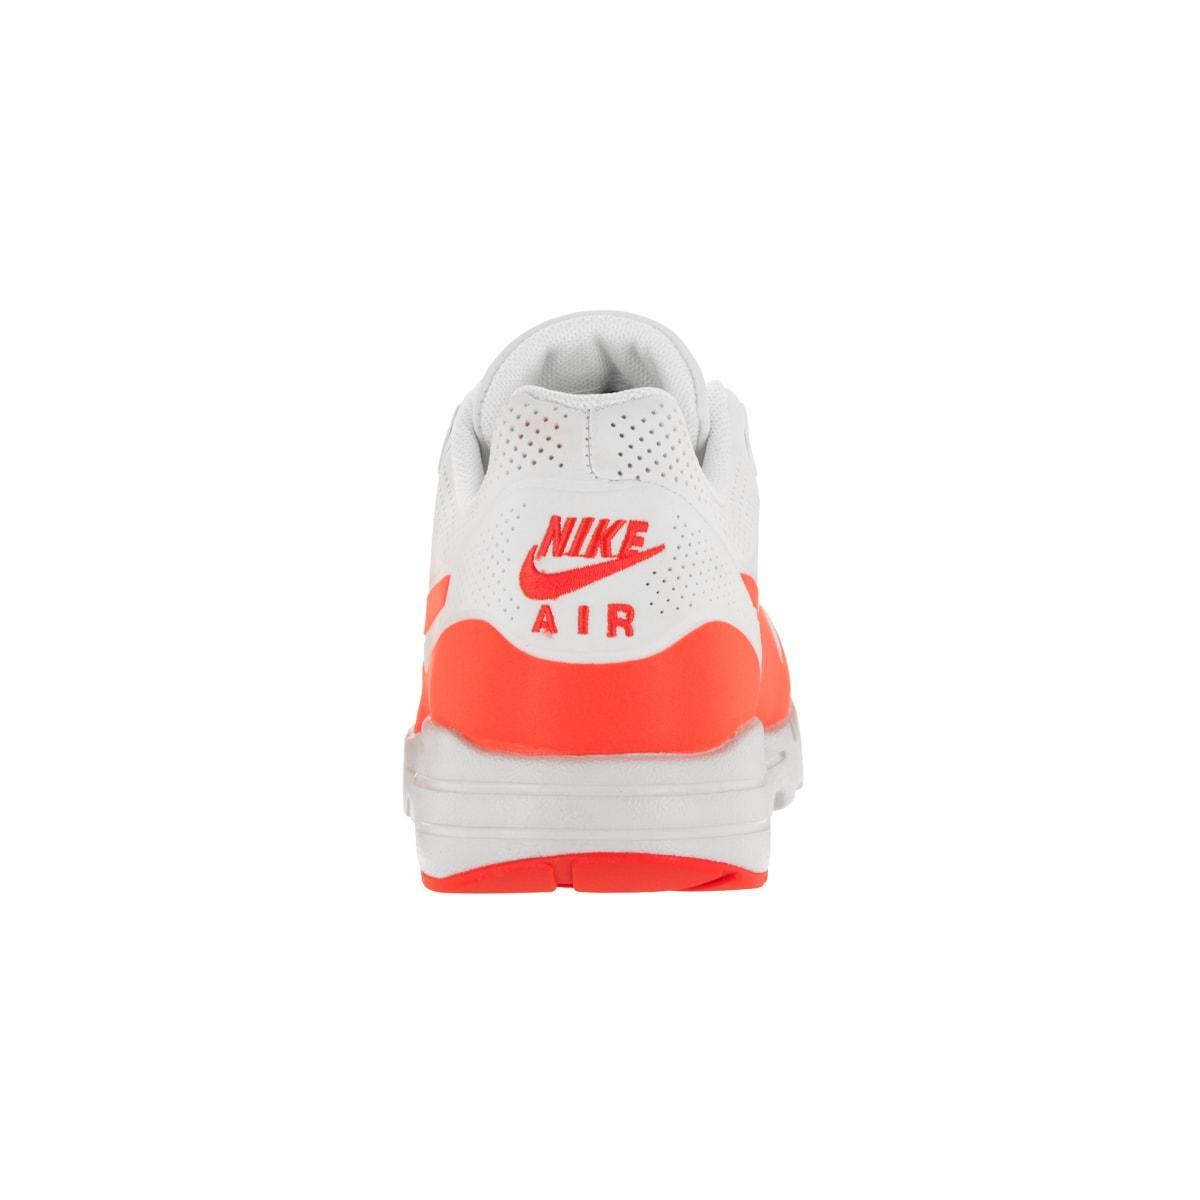 Nike Women's Air Max 1 Ultra Moire Summit WhiteTotal Crimson Running Shoe